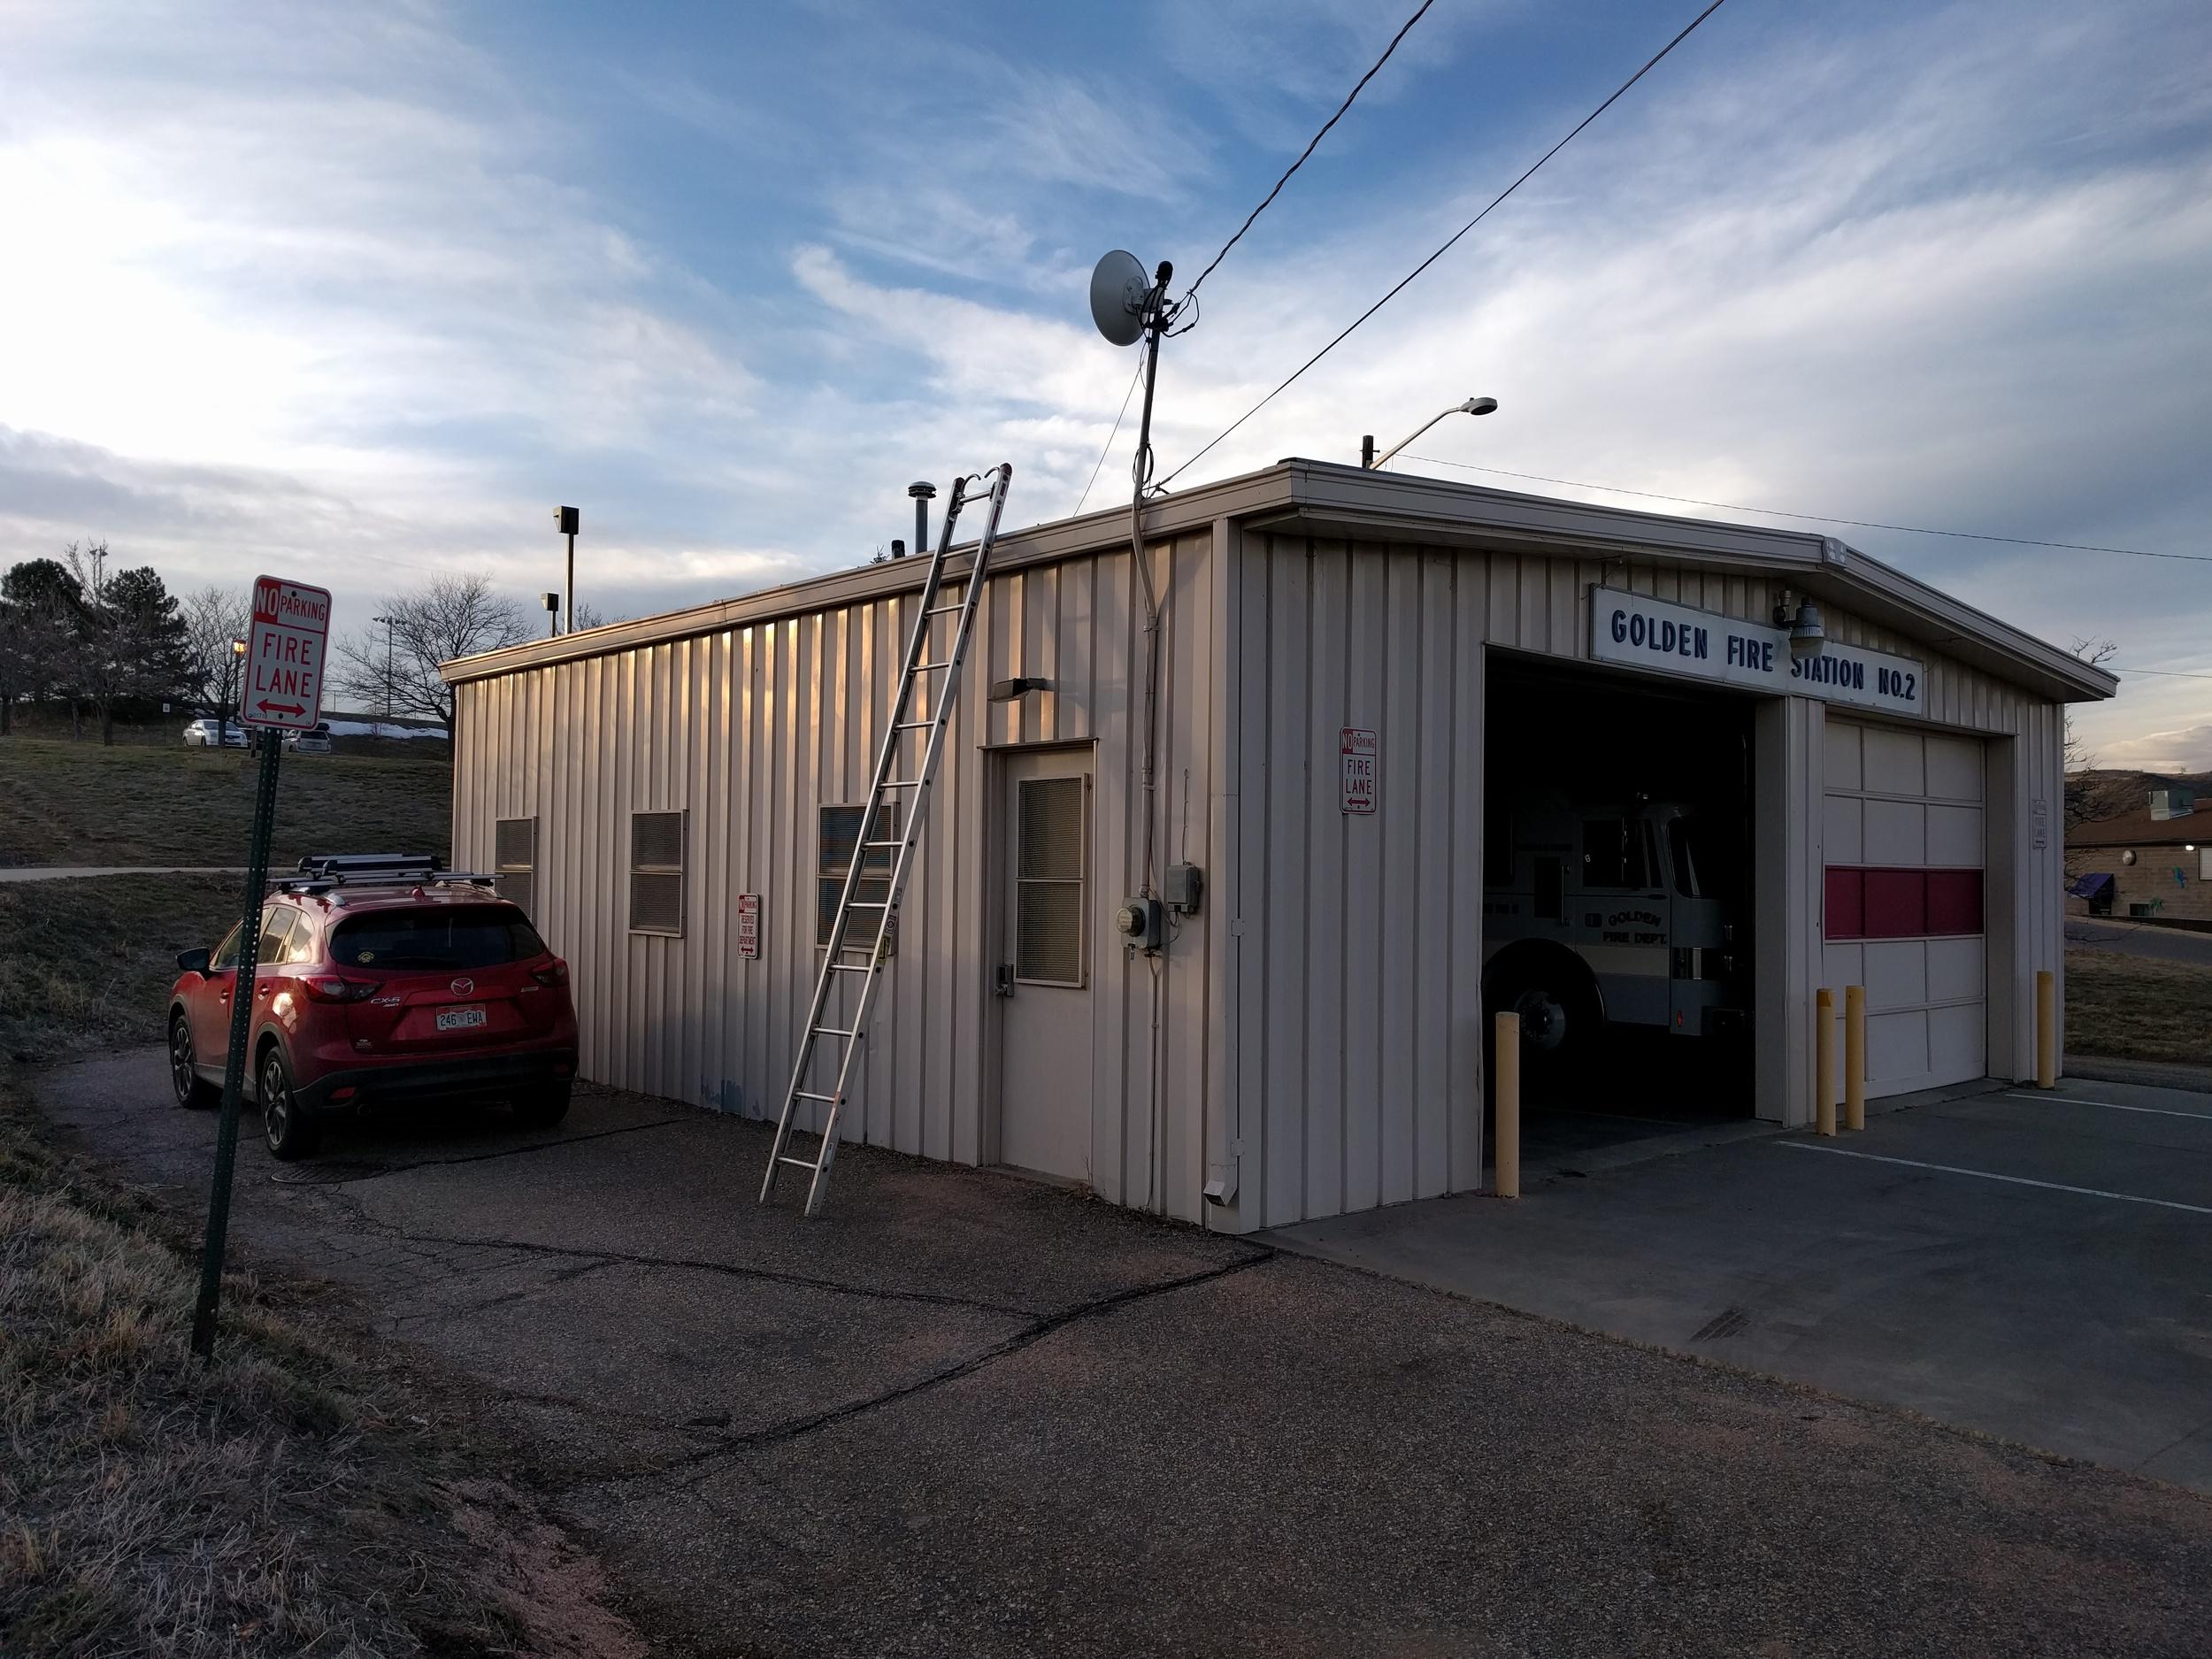 Golden Fire Station 22 goes on-line